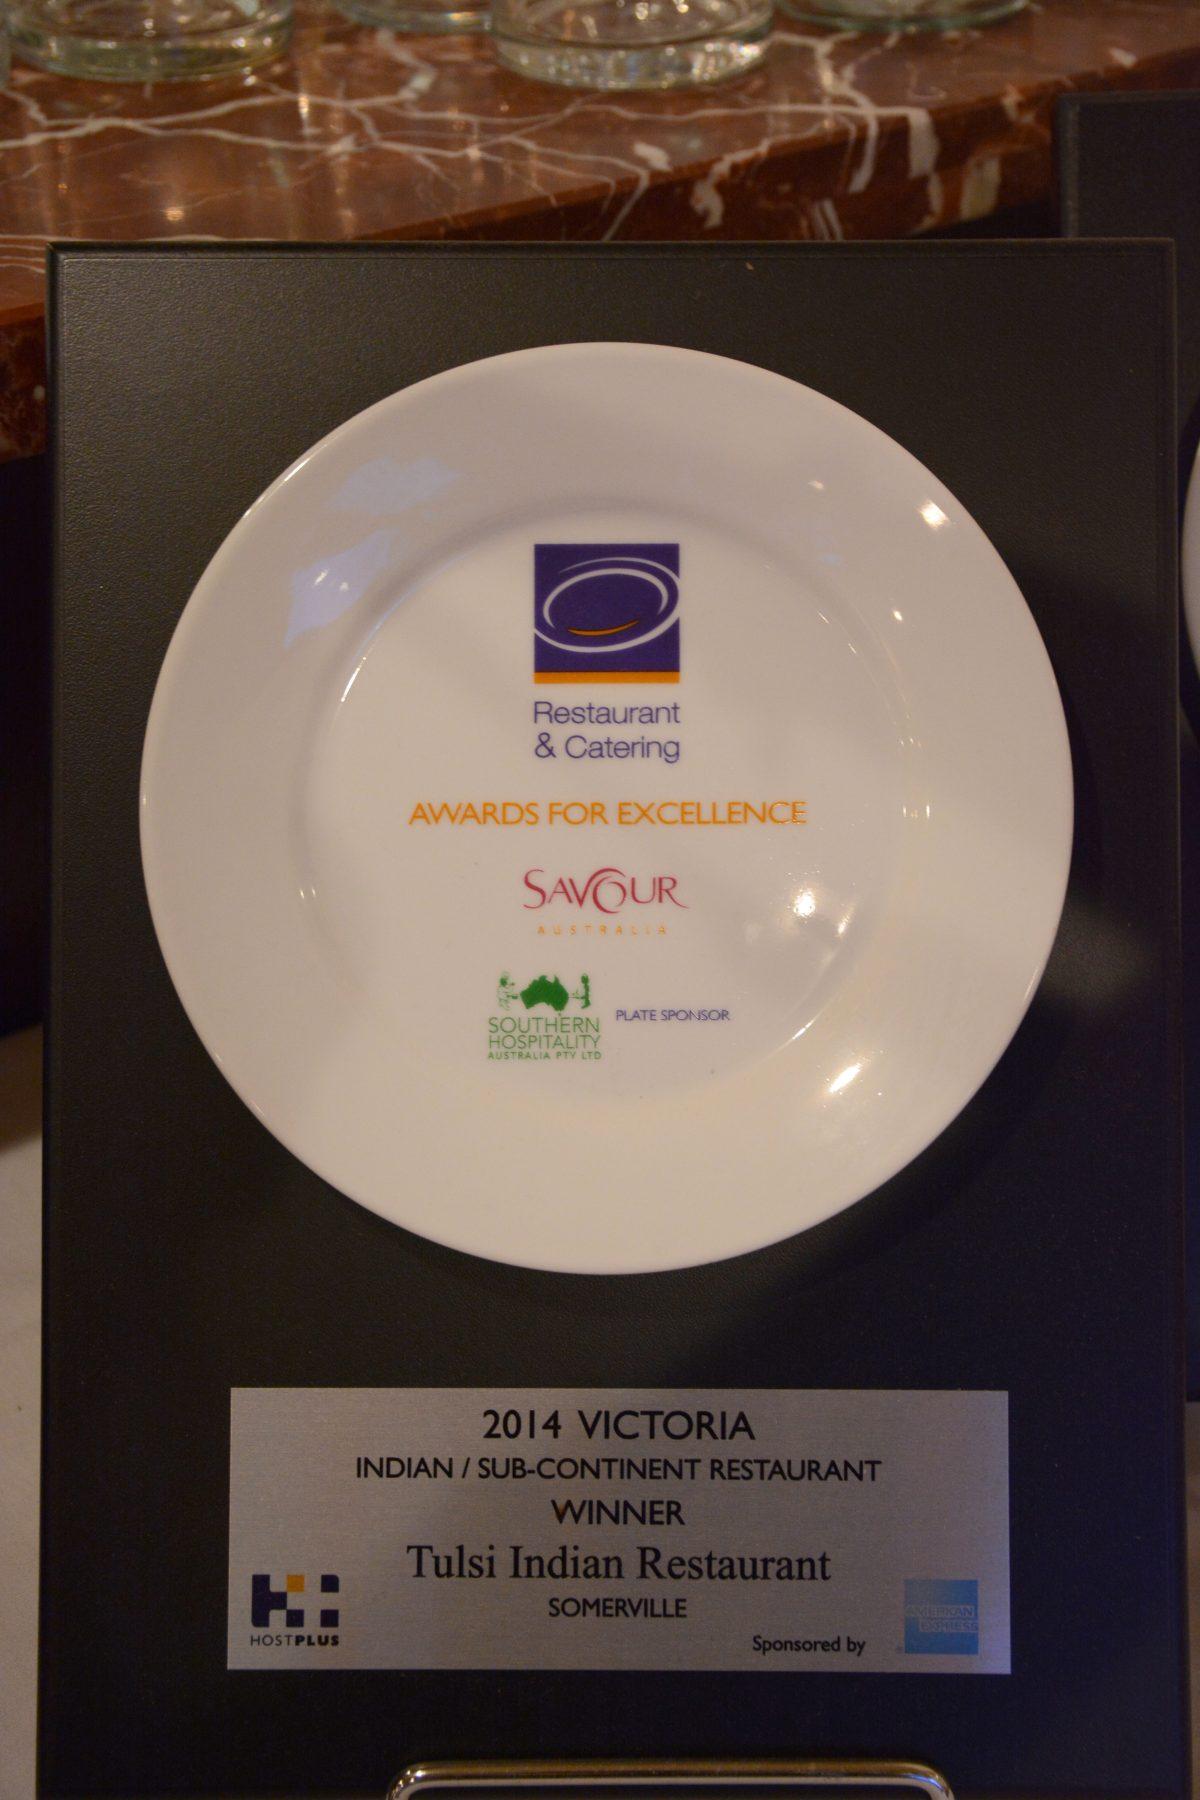 One among the many awards won by Tulsi!